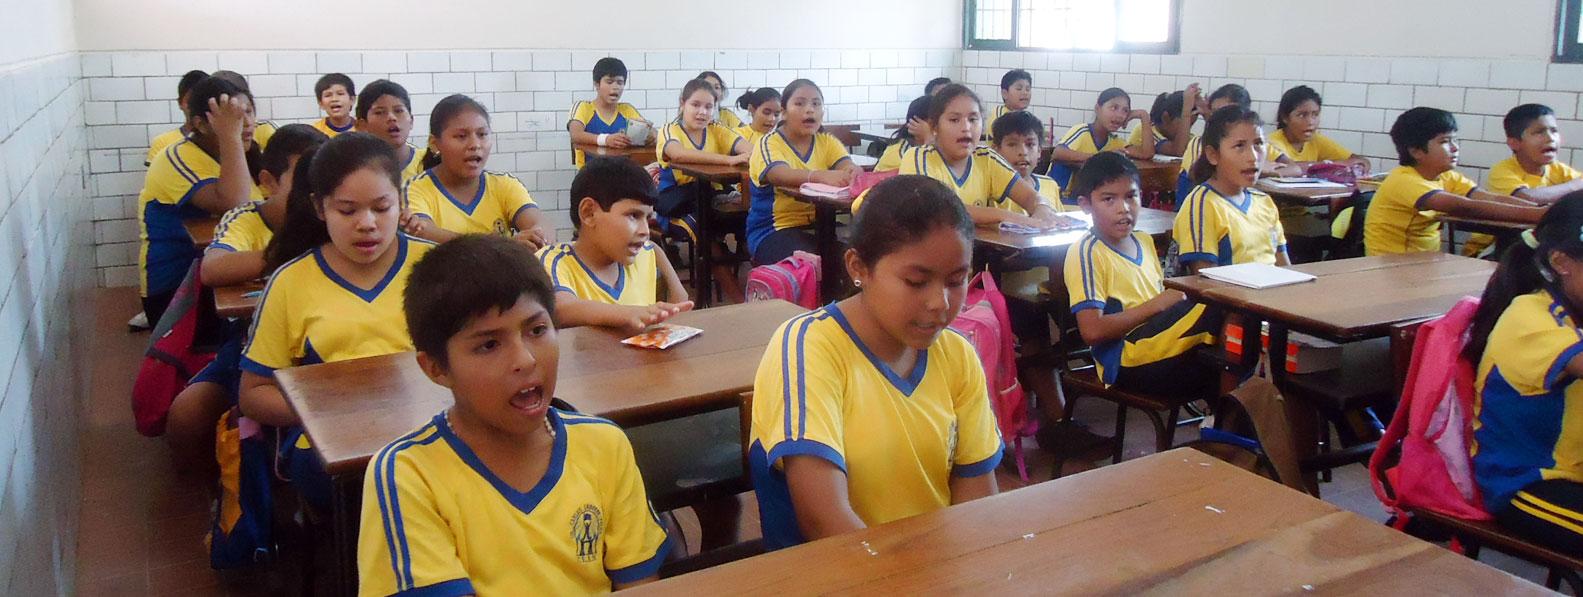 Bolivia scuola